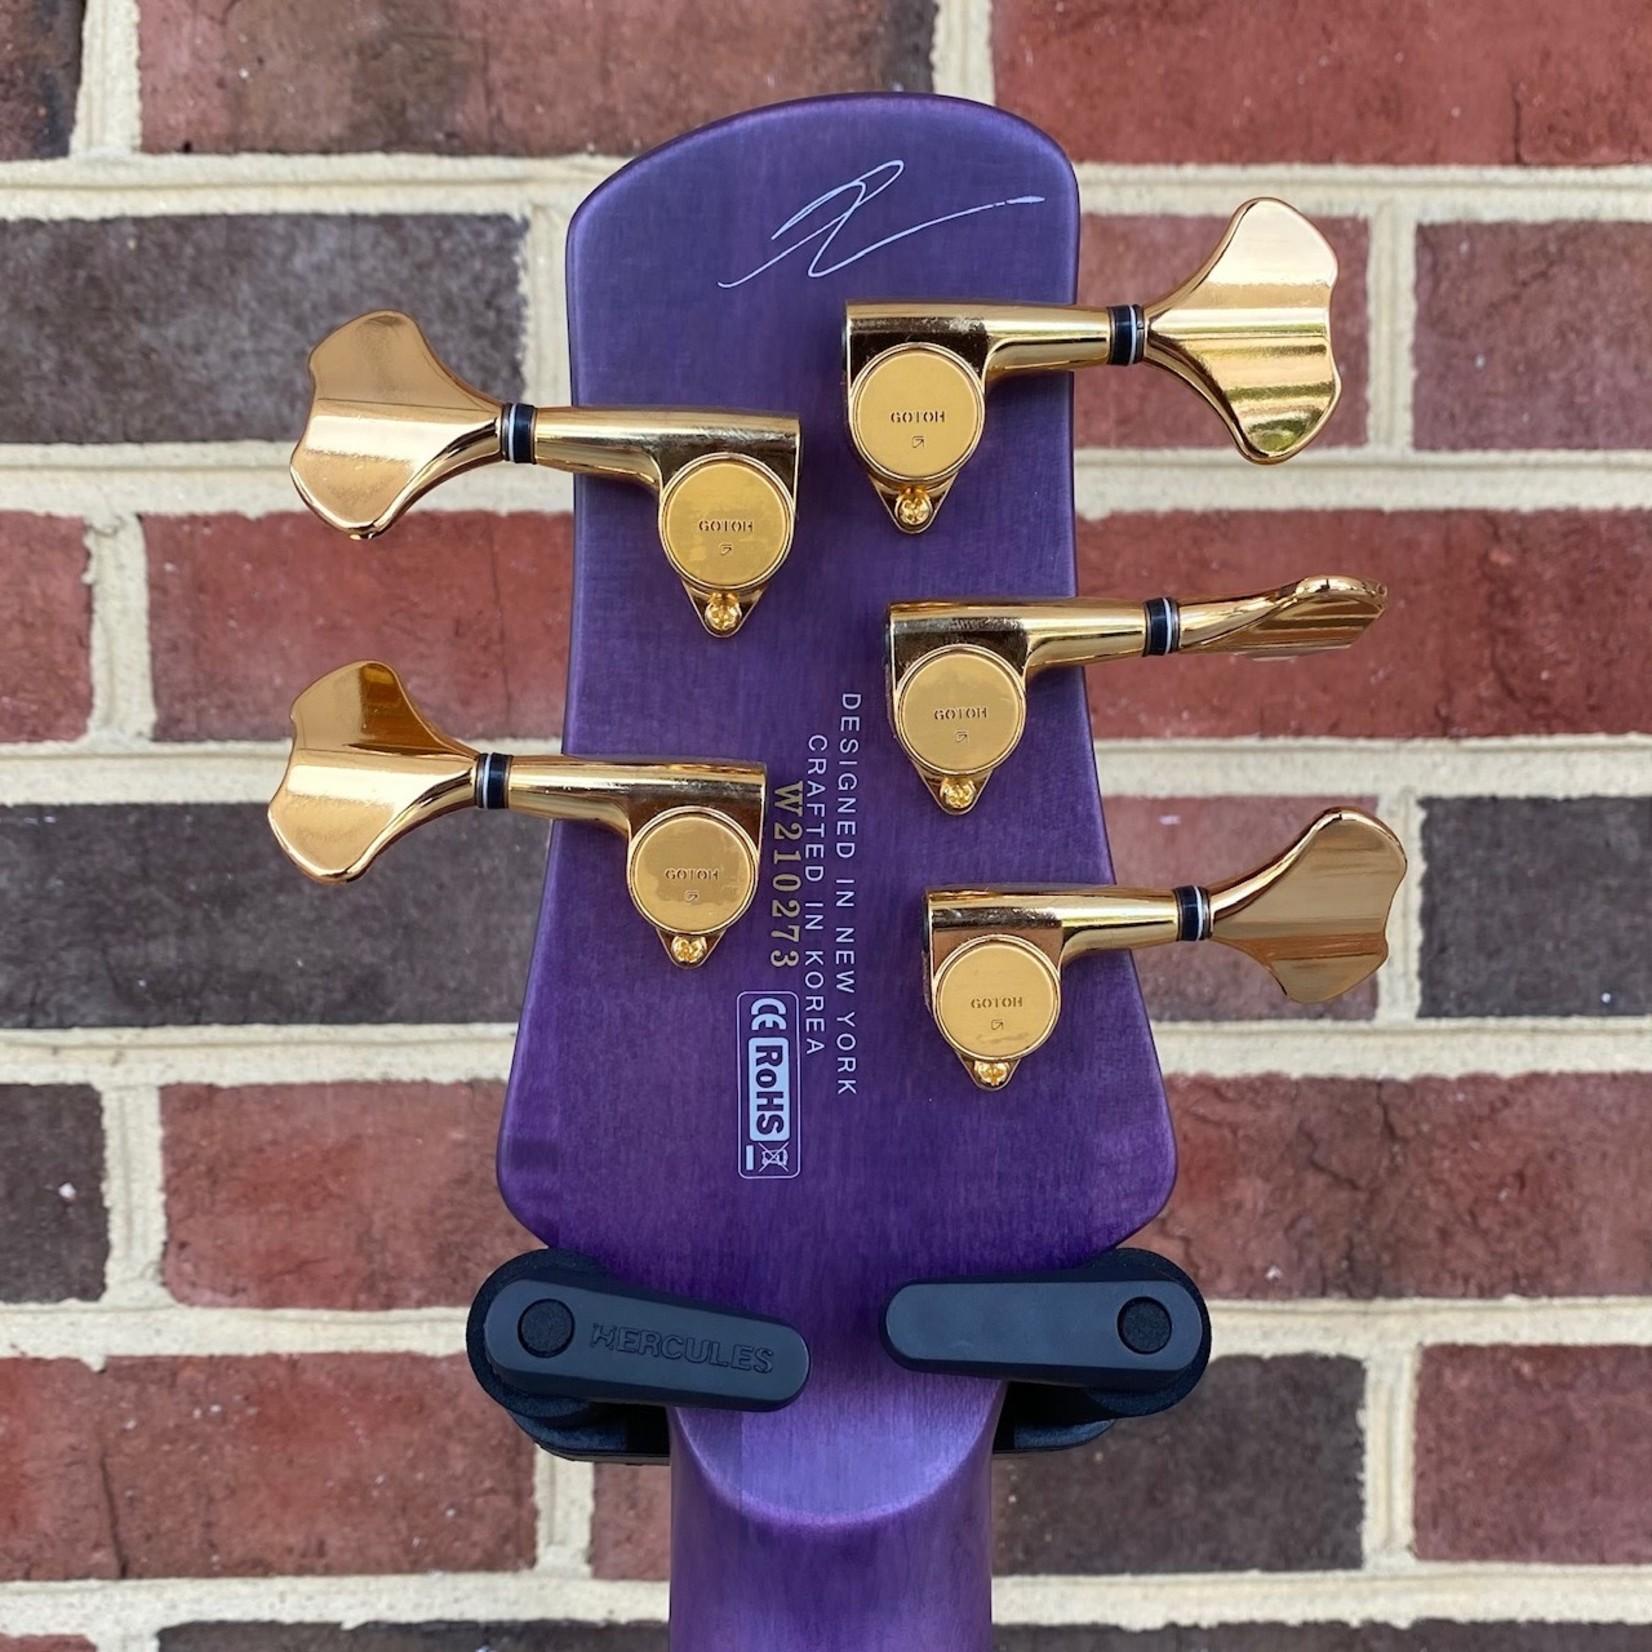 Spector Spector Skyler Acord Signature Model, 5-String, Neck-Thru, Violet Stain Matte, Custom Wound Bartolini Pickup, Spector Tone Pump Jr. Preamp